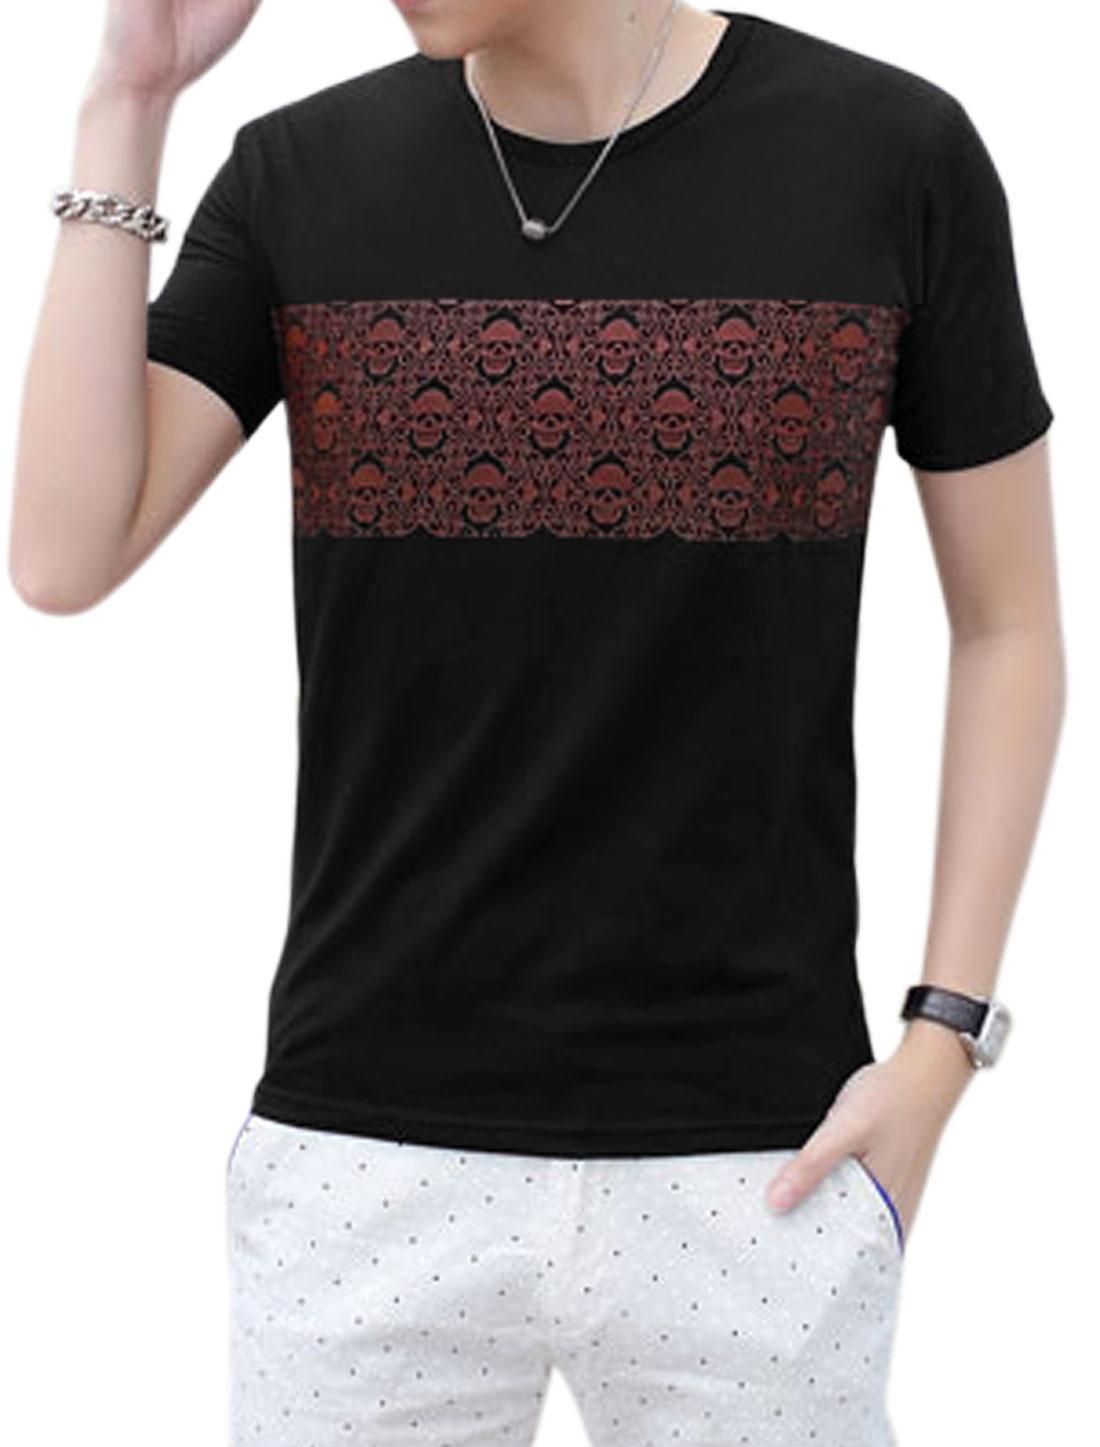 Men Skull Pattern Round Neck Slipover Casual Tee Shirts Black S